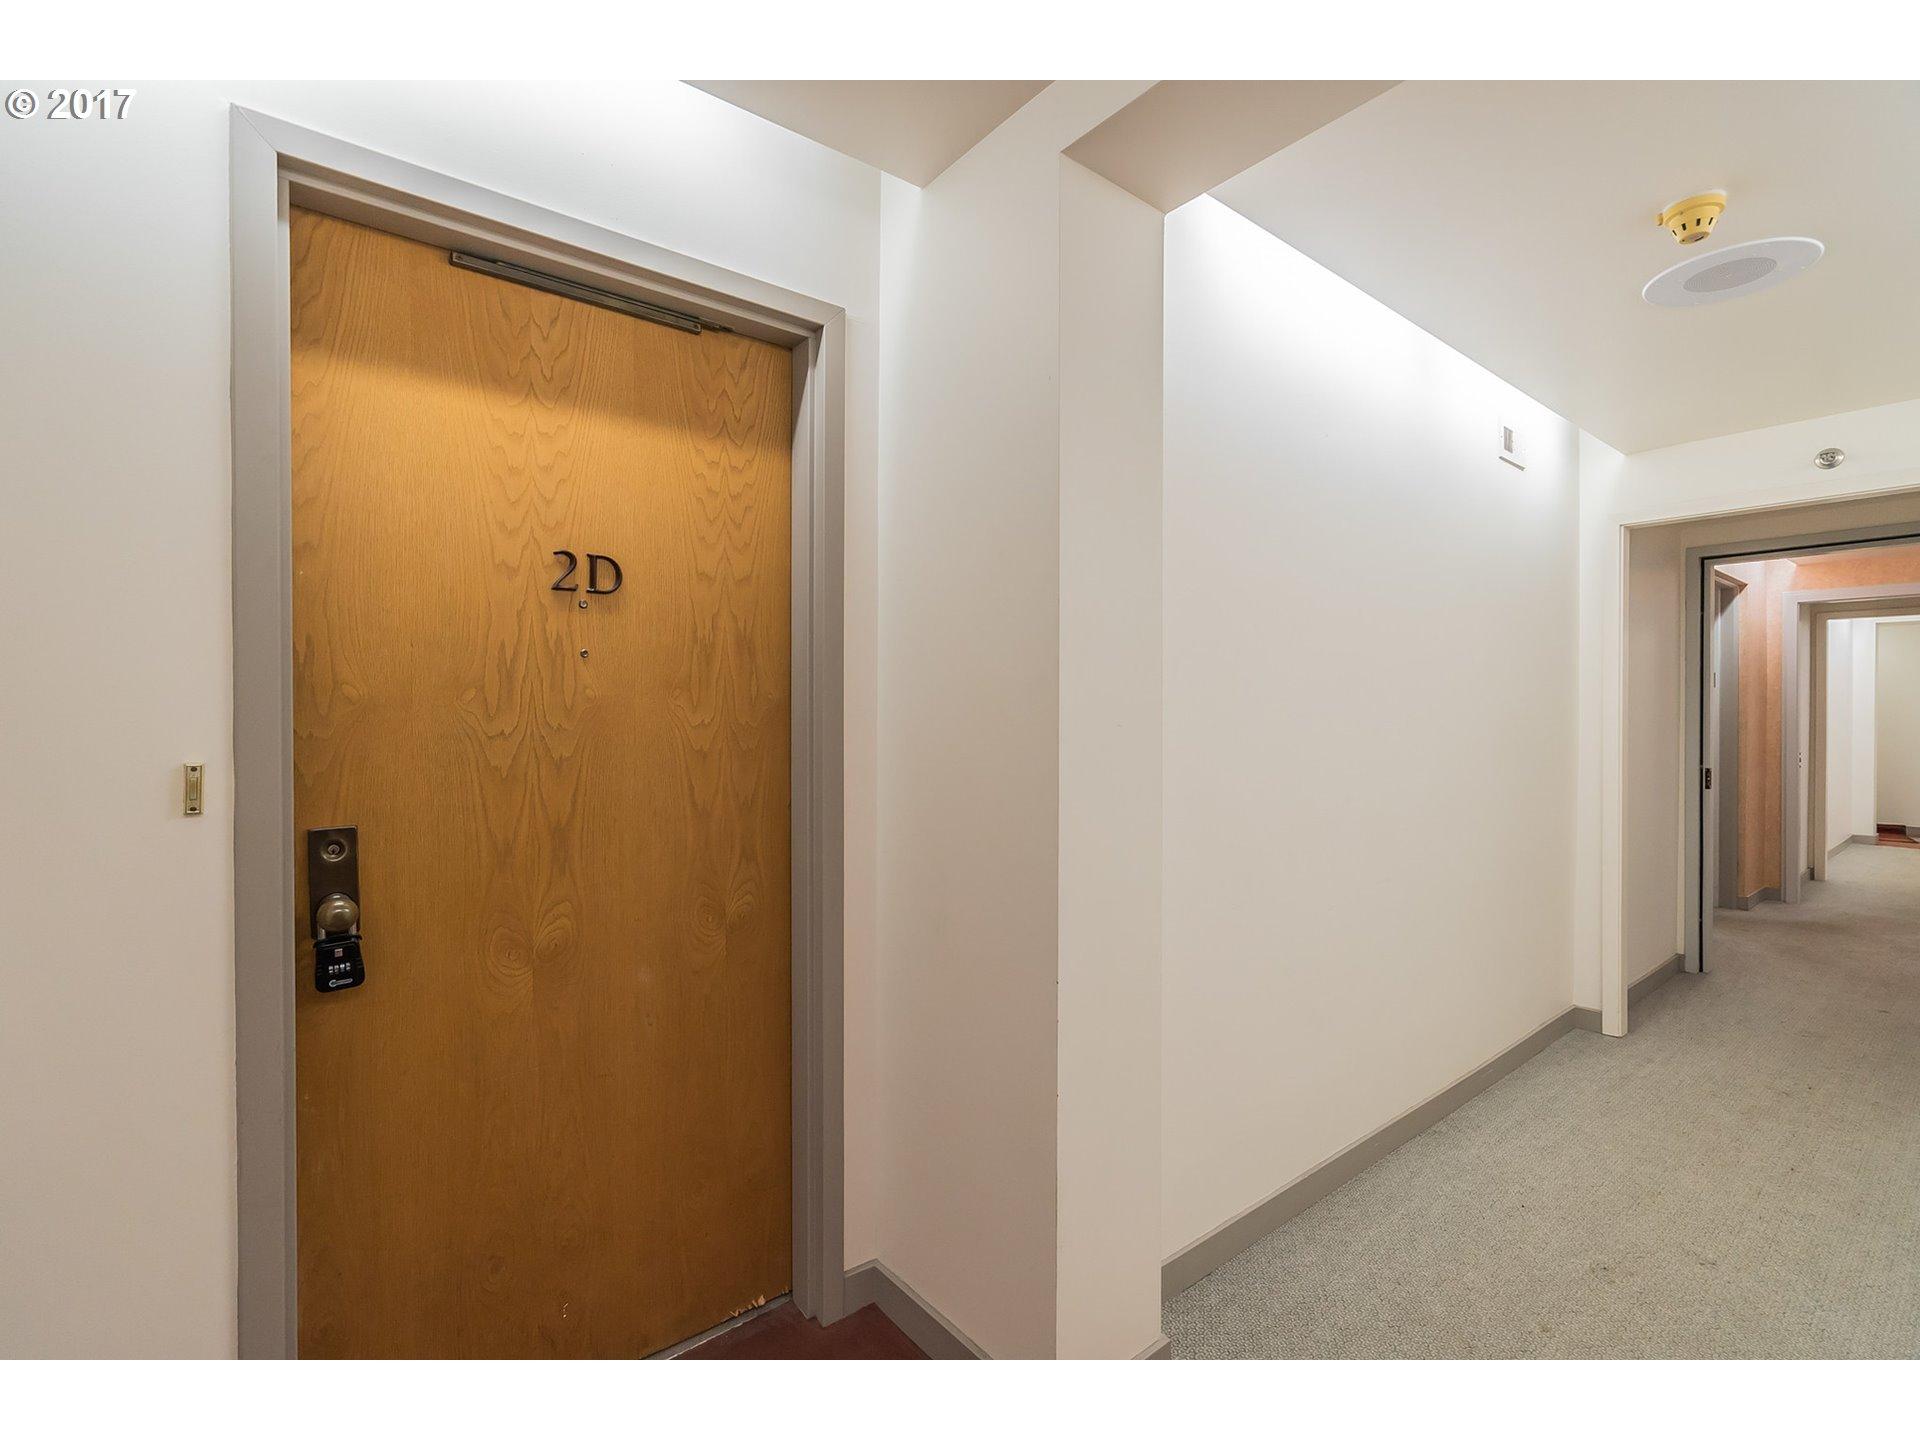 2245 SW PARK PL 2 D Portland, OR 97205 - MLS #: 17690060